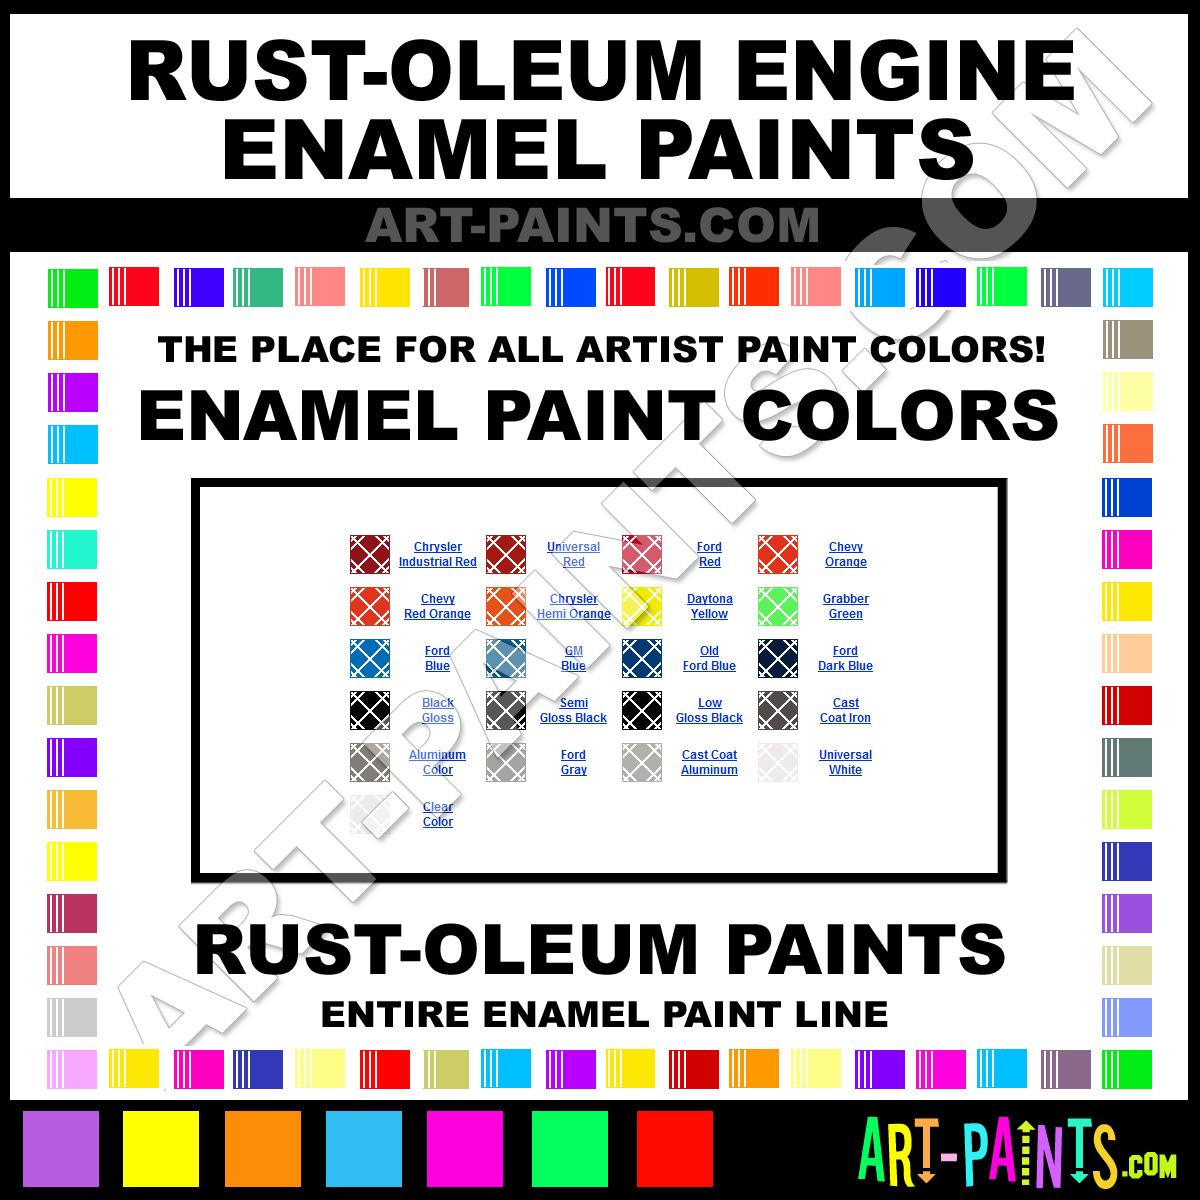 Rust Oleum Engine Enamel Enamel Paint Colors Rust Oleum